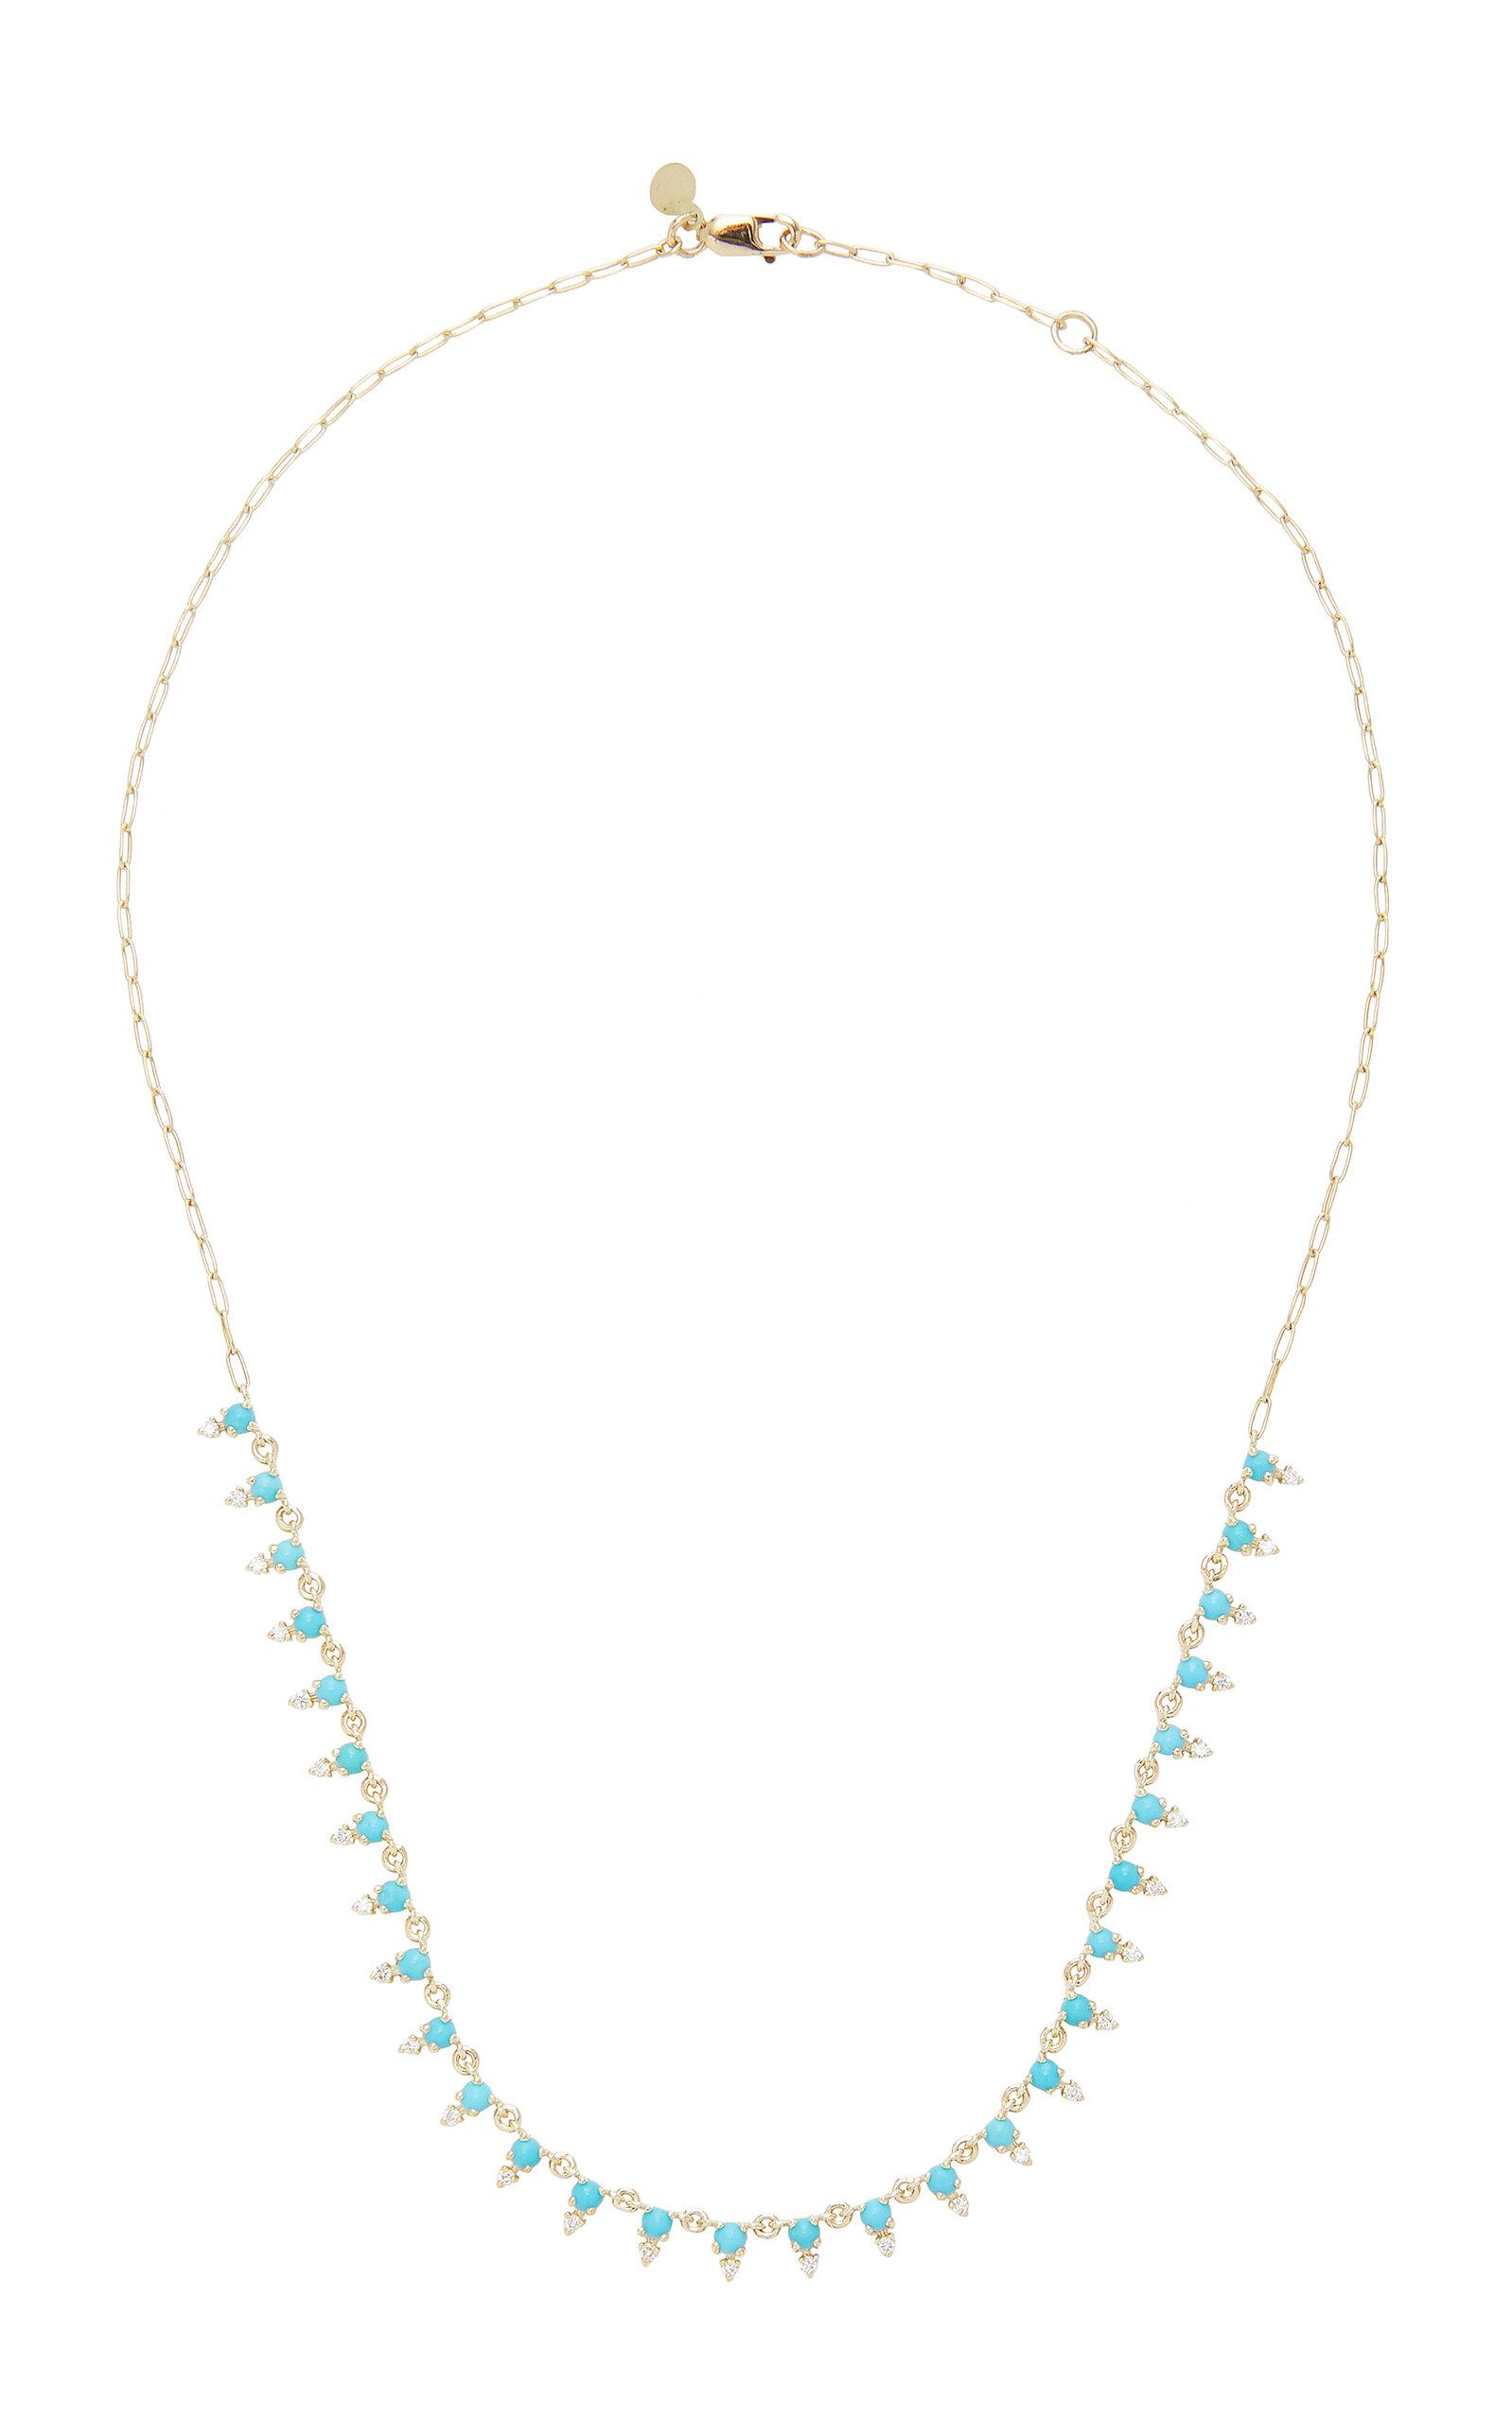 ILA - Women's Deja 14K Gold Turquoise and Diamond Necklace - Blue - Moda Operandi